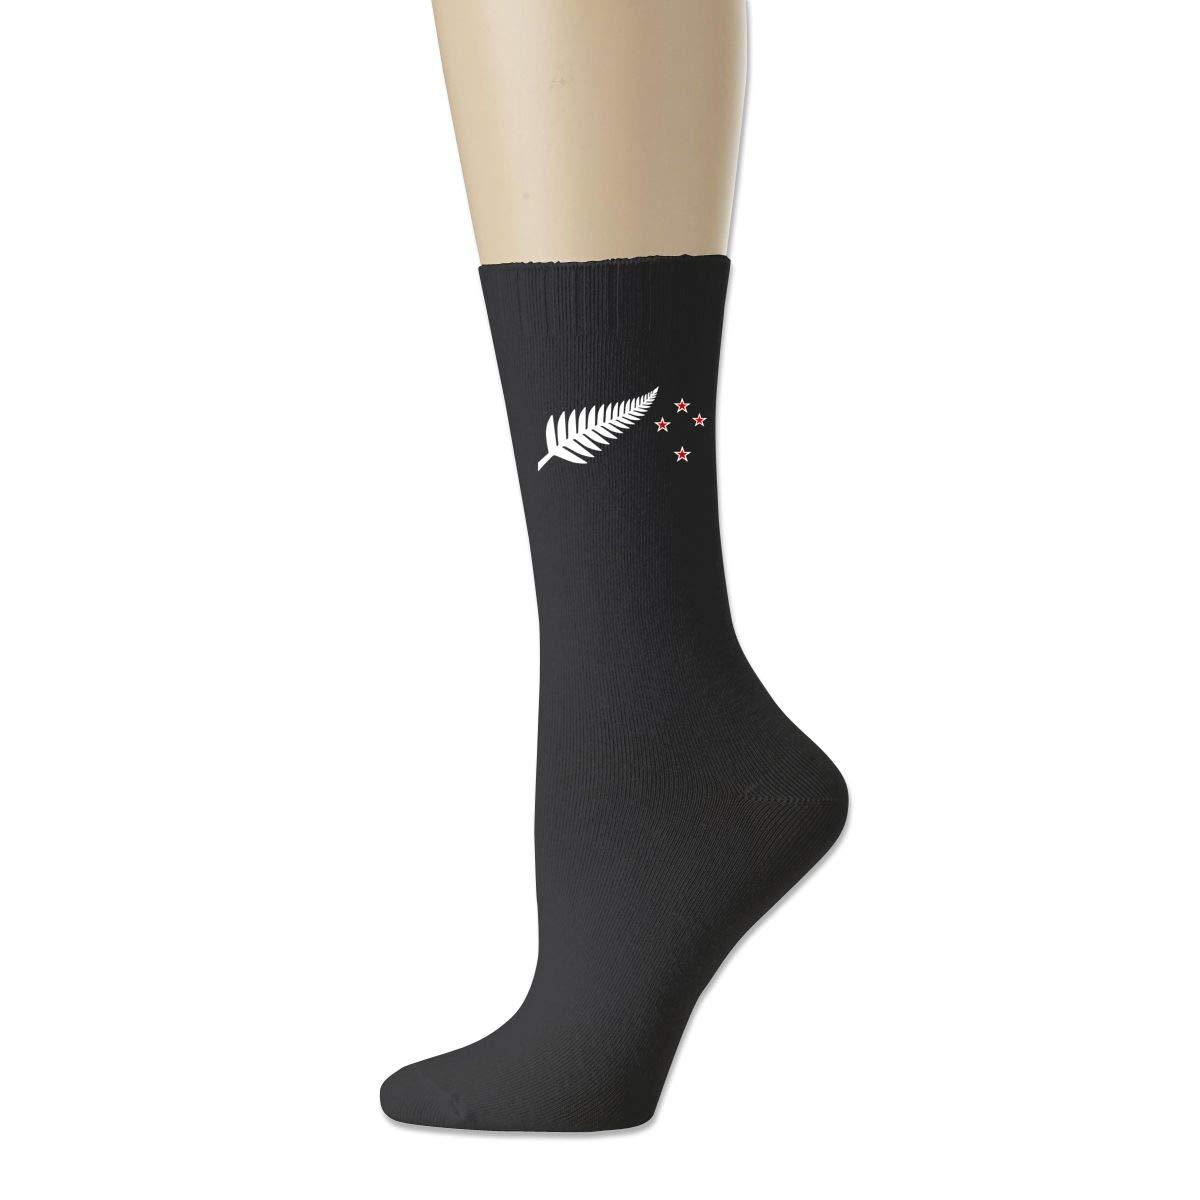 Cotton Crew Bobbysox Ski Socks Unisex Soccer Socks Flag Of New Zealand